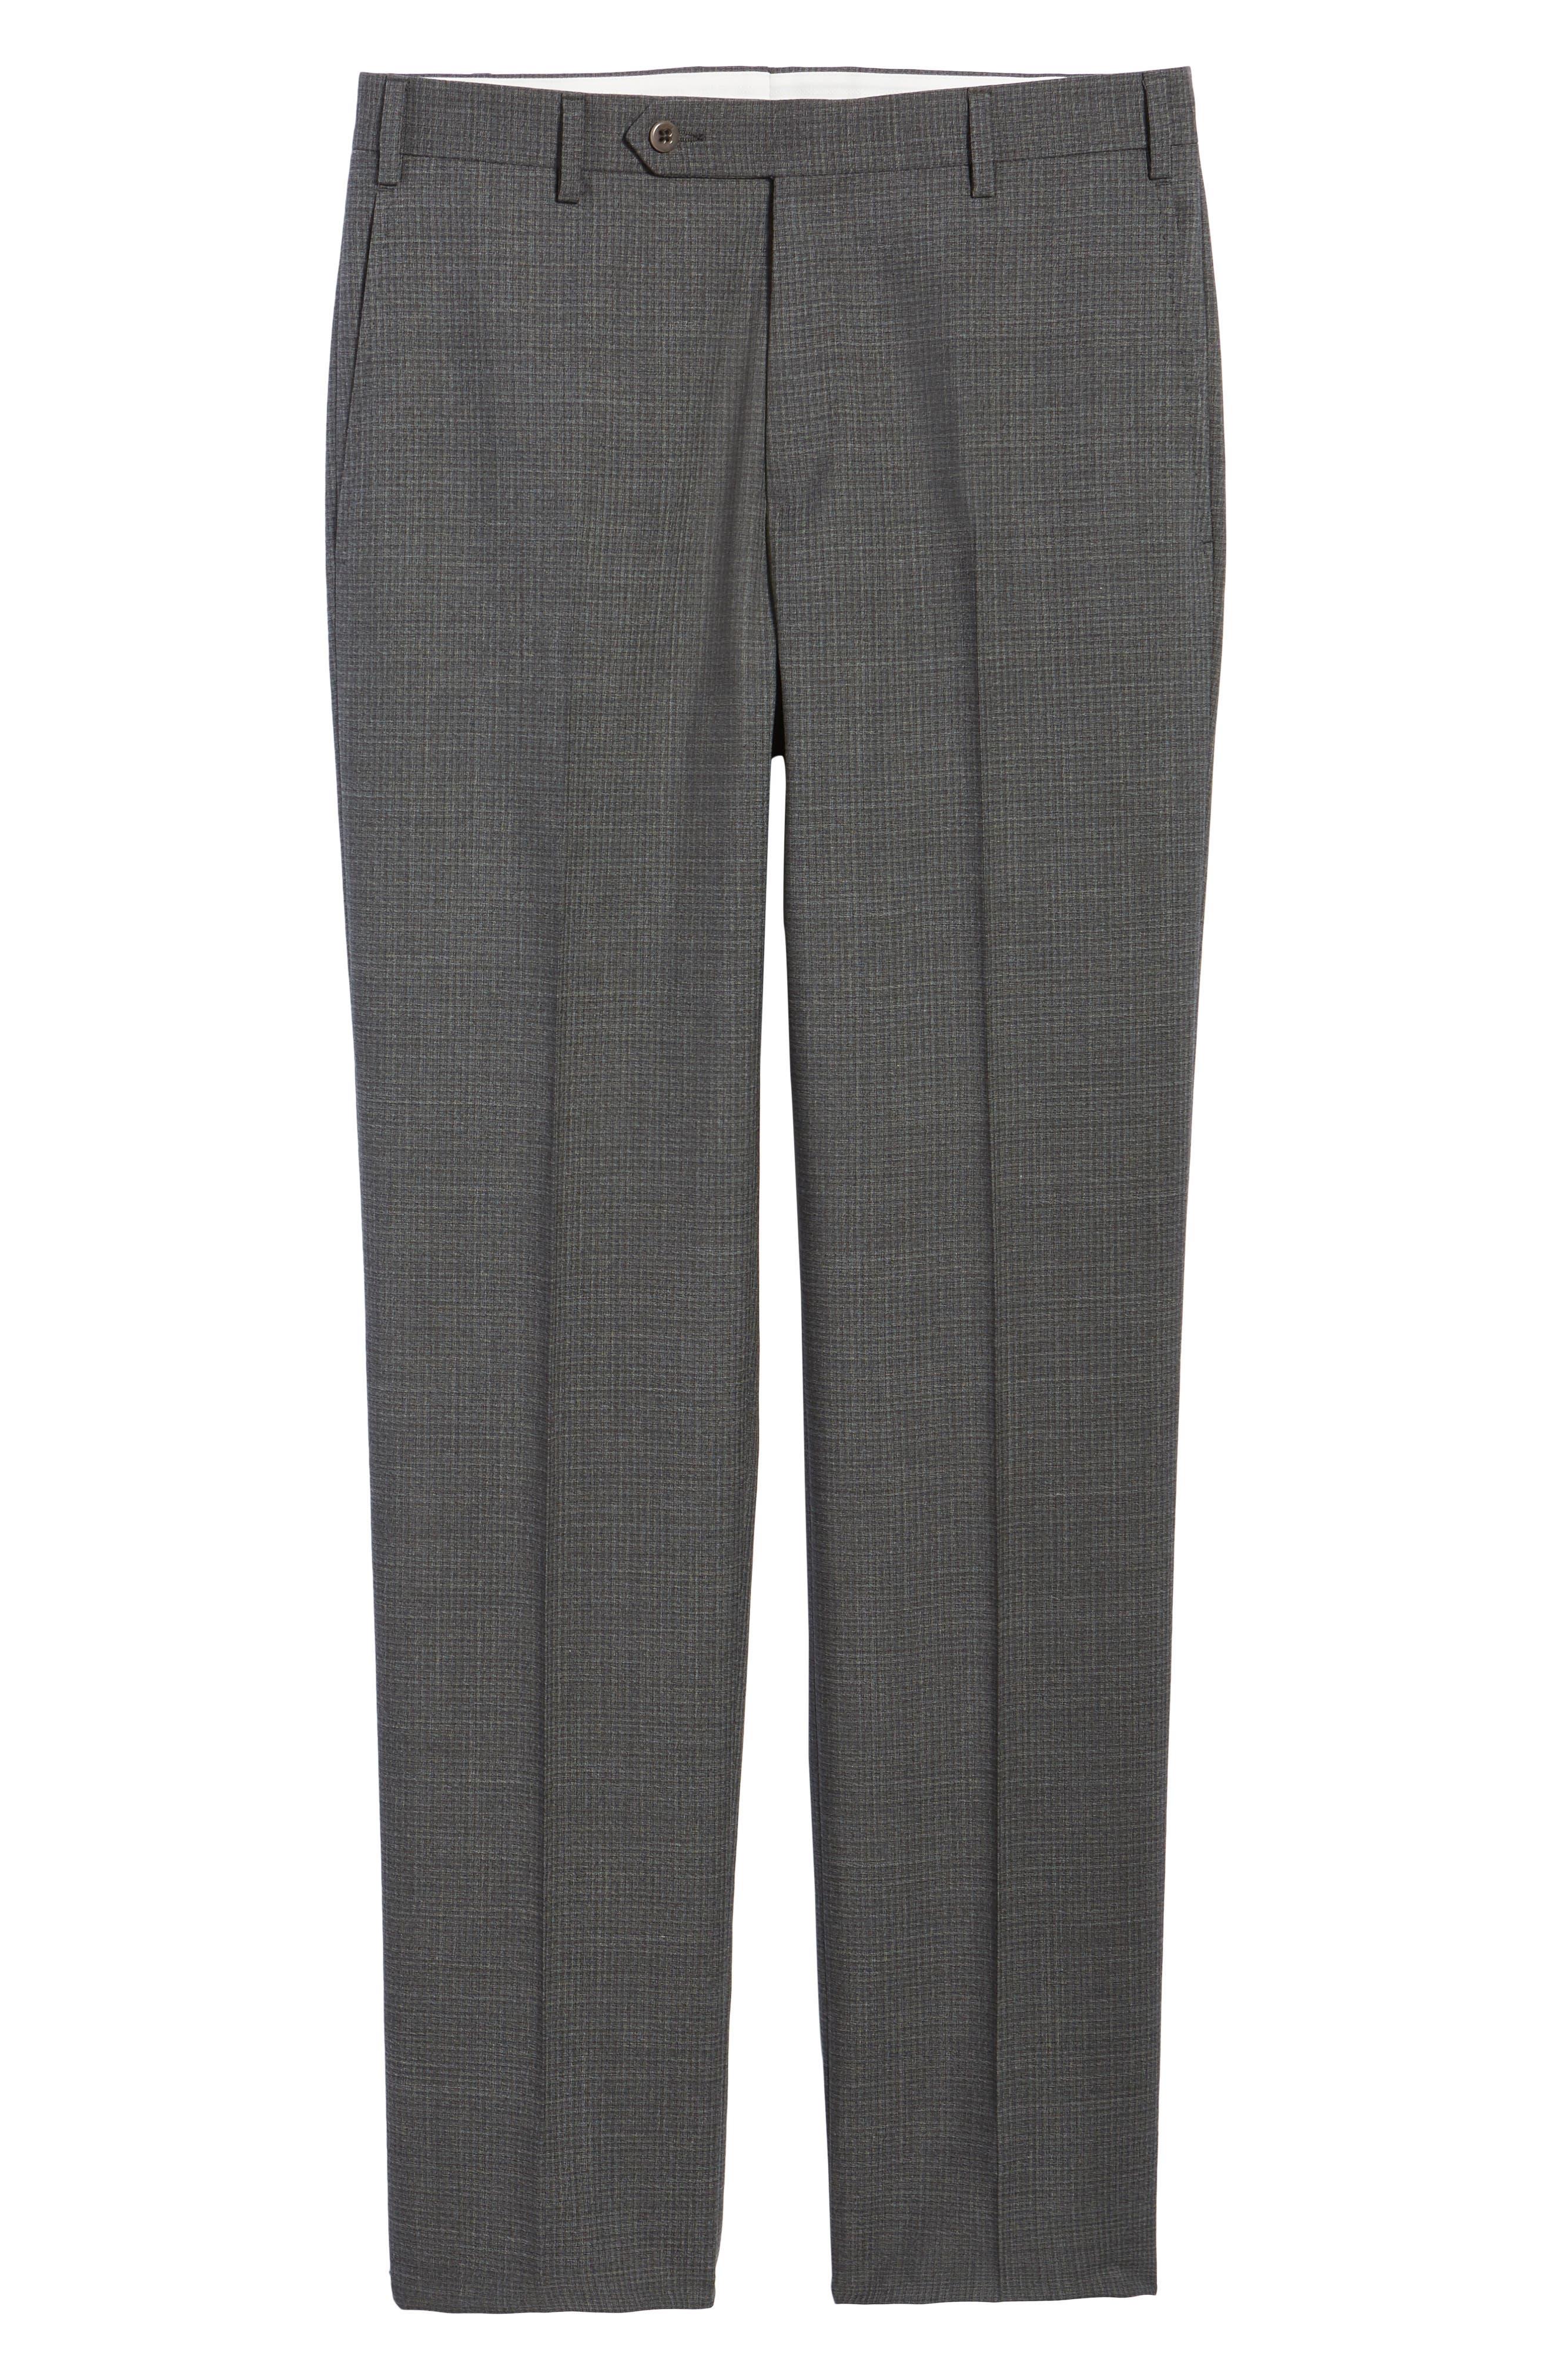 Devon Flat Front Check Wool Trousers,                             Alternate thumbnail 6, color,                             020